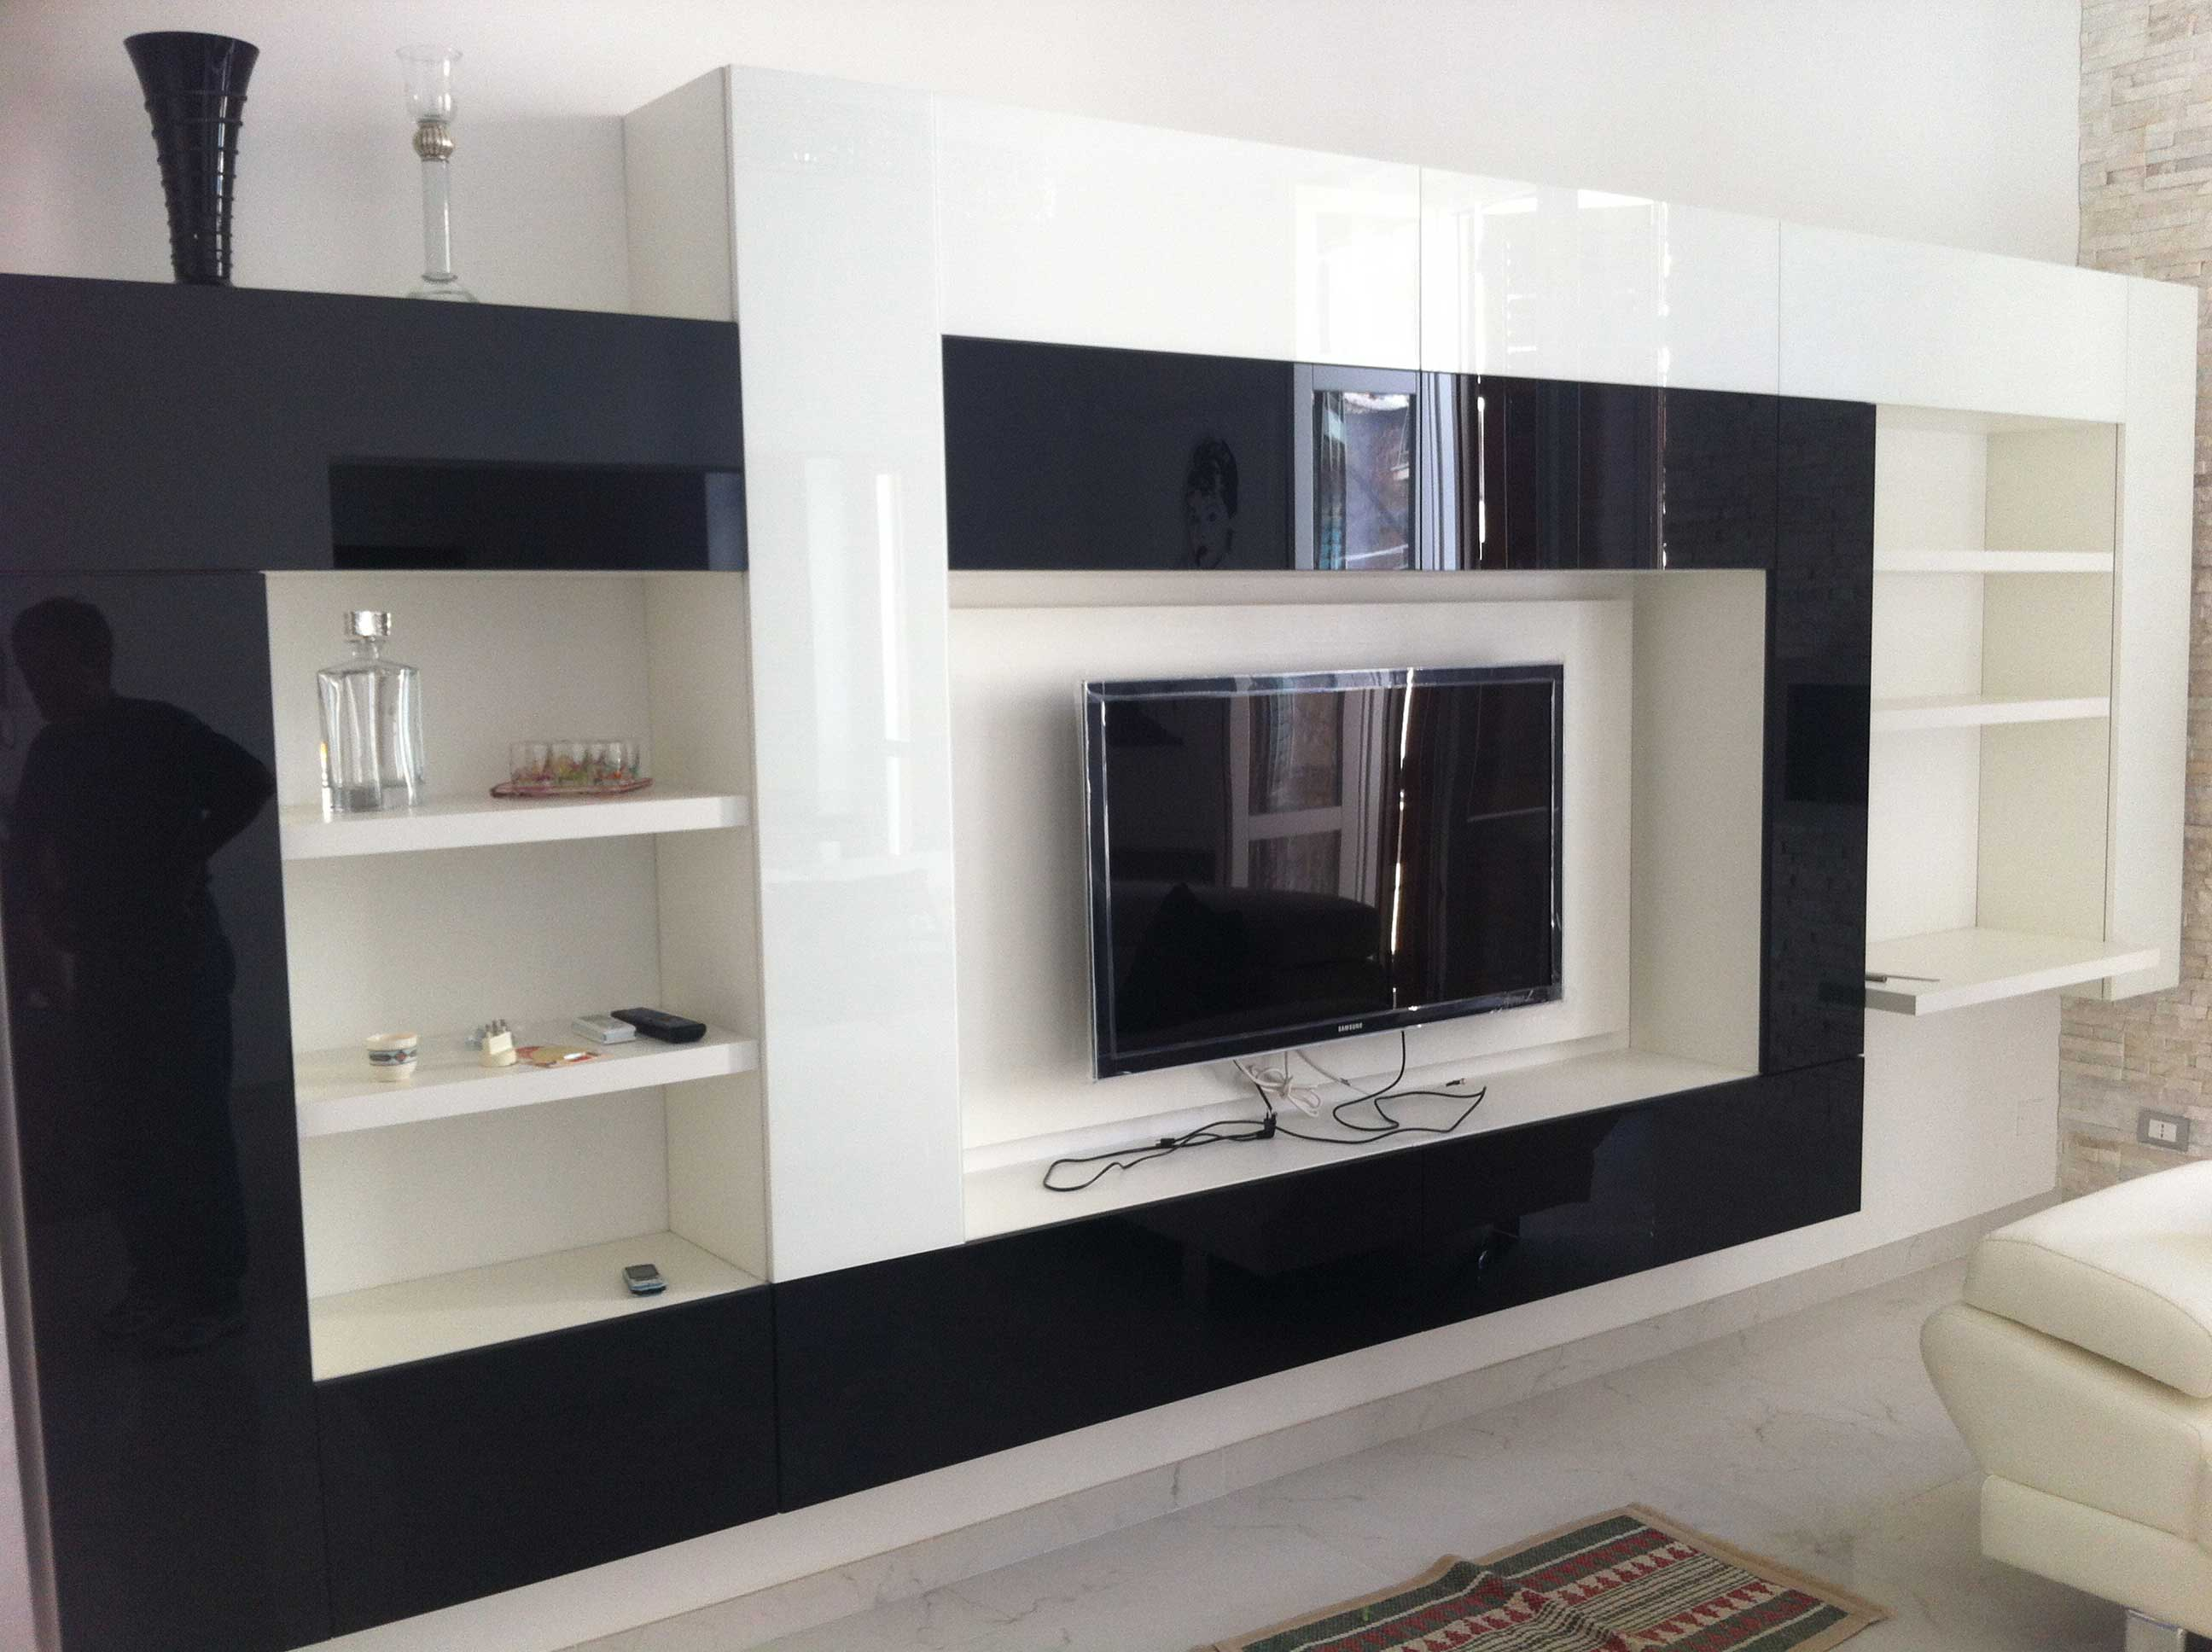 Parete kico living zichichi mobili - Mobili per salone moderni ...